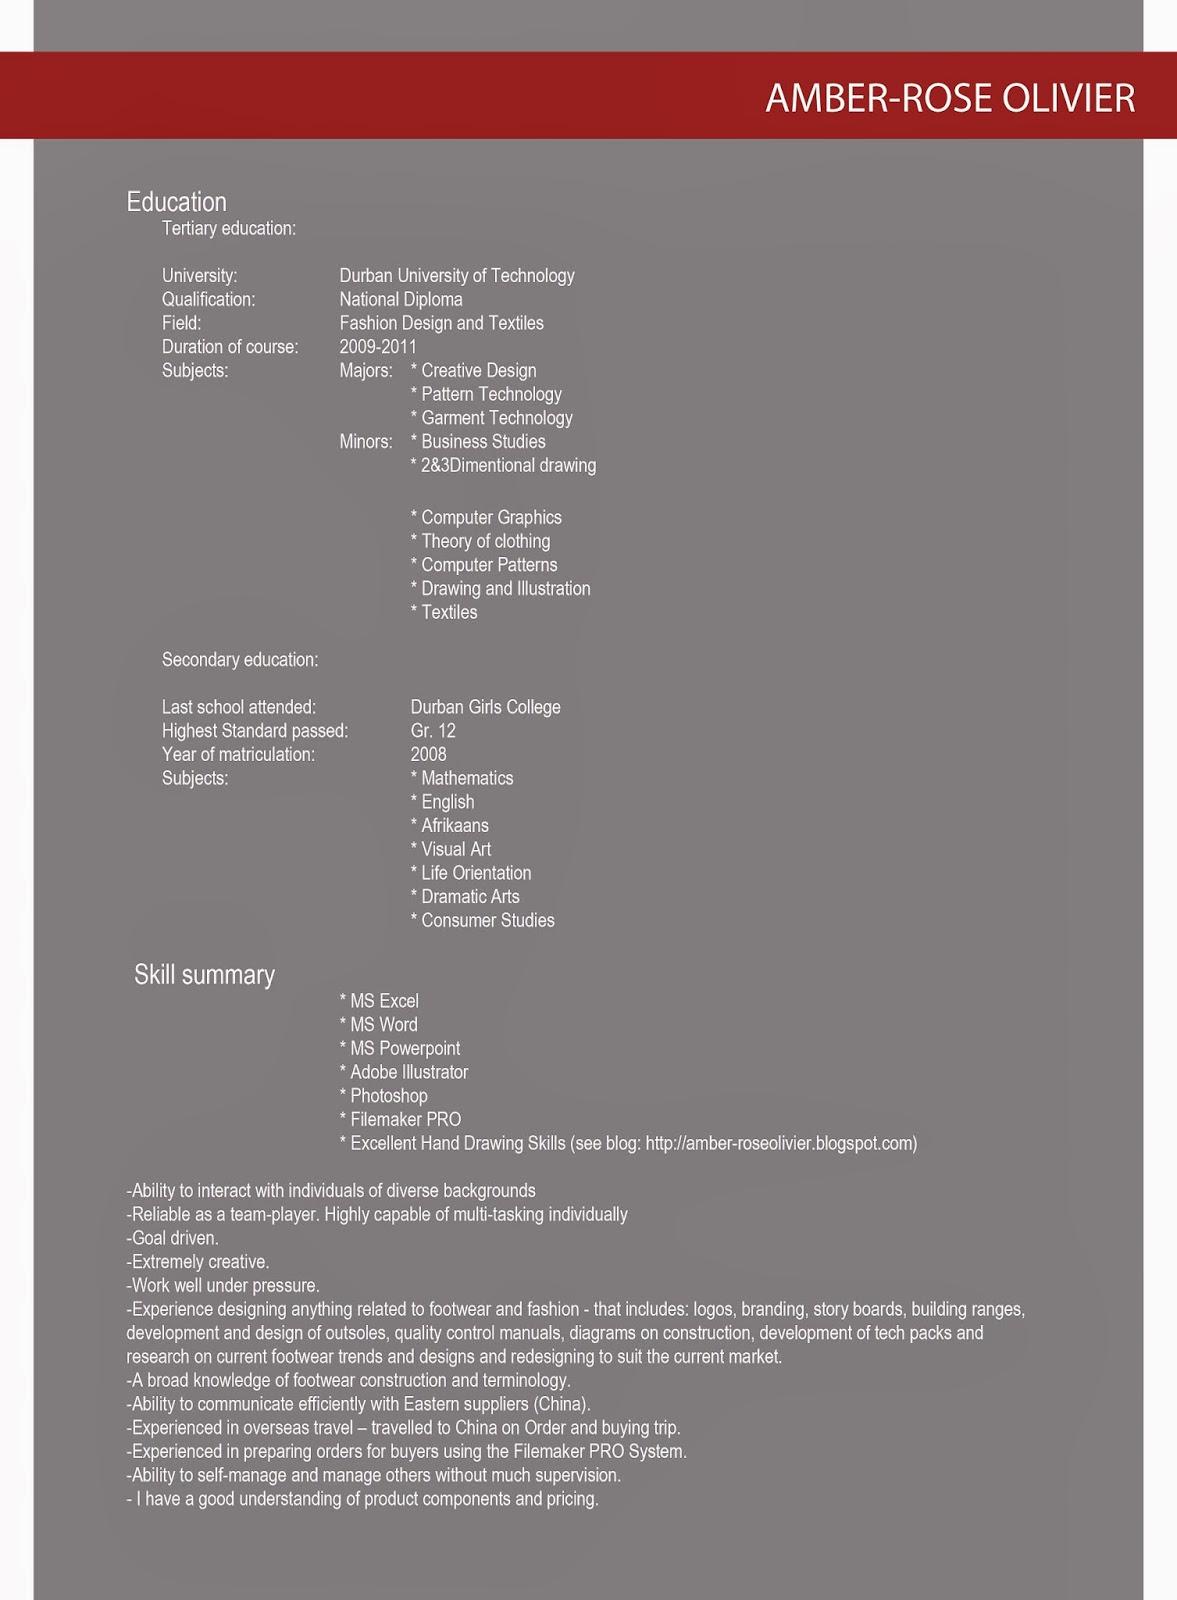 Portfolio And CV Preview Booklet Designed By Amber Rose Olivier I